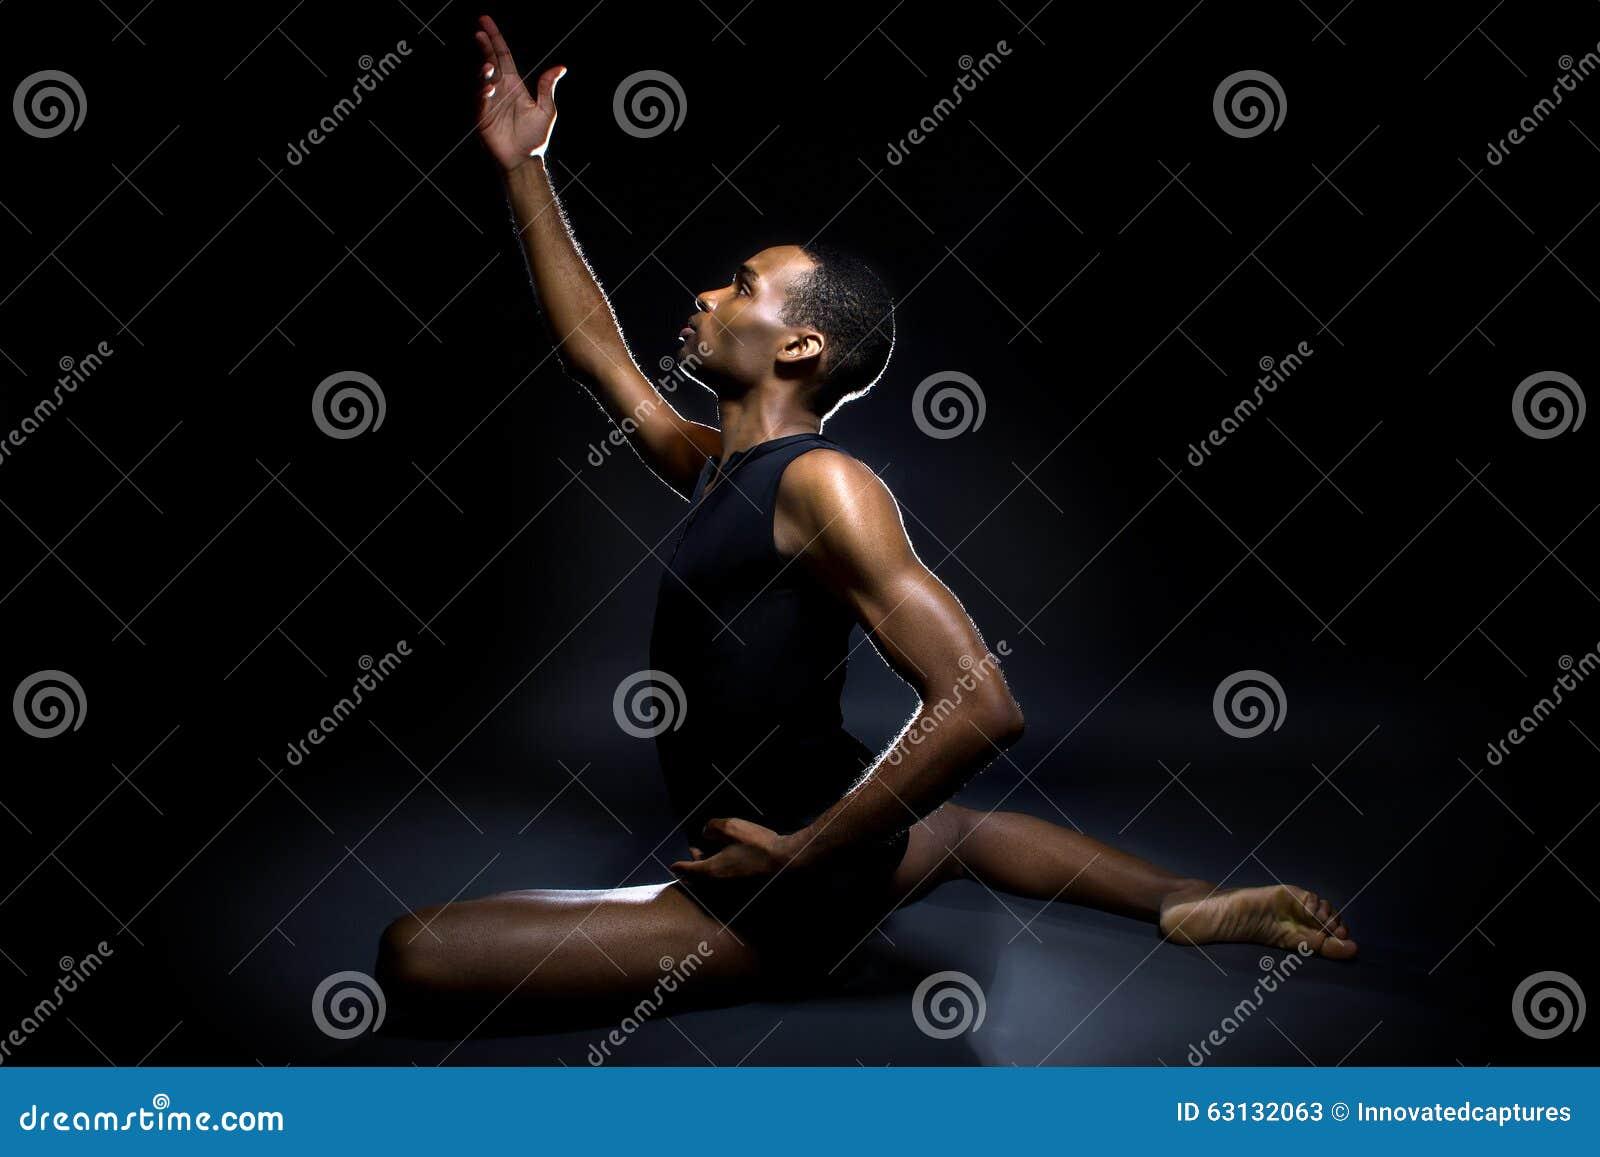 Танцор демонстрируя гибкость